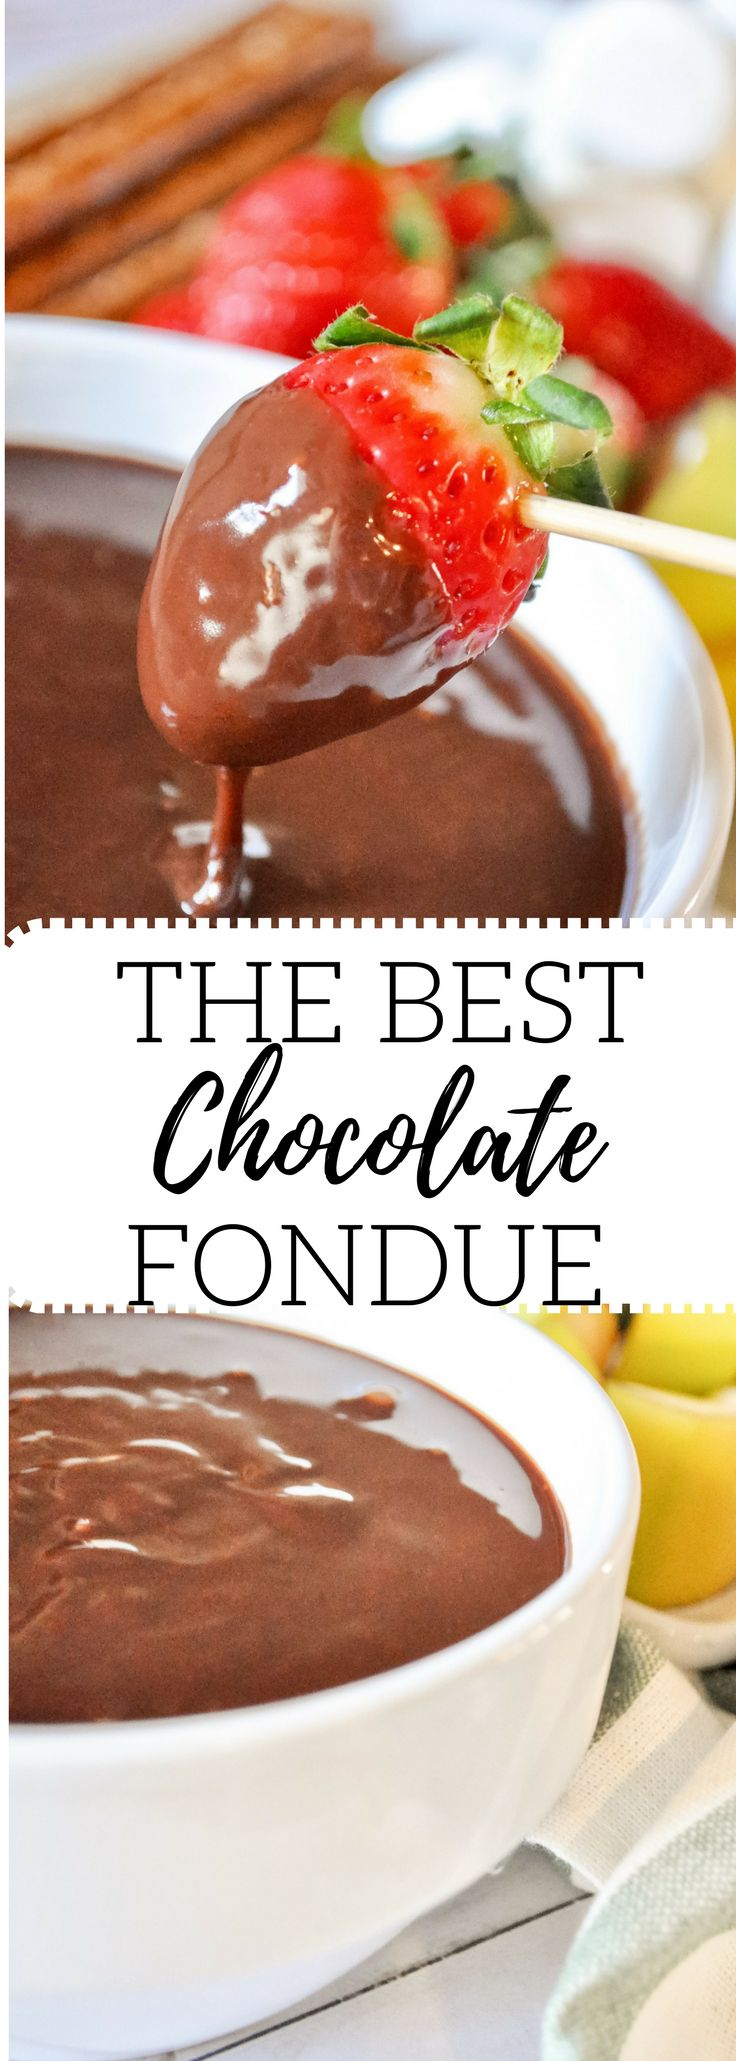 100+ Chocolate fondue recipes on Pinterest | Fondue ...